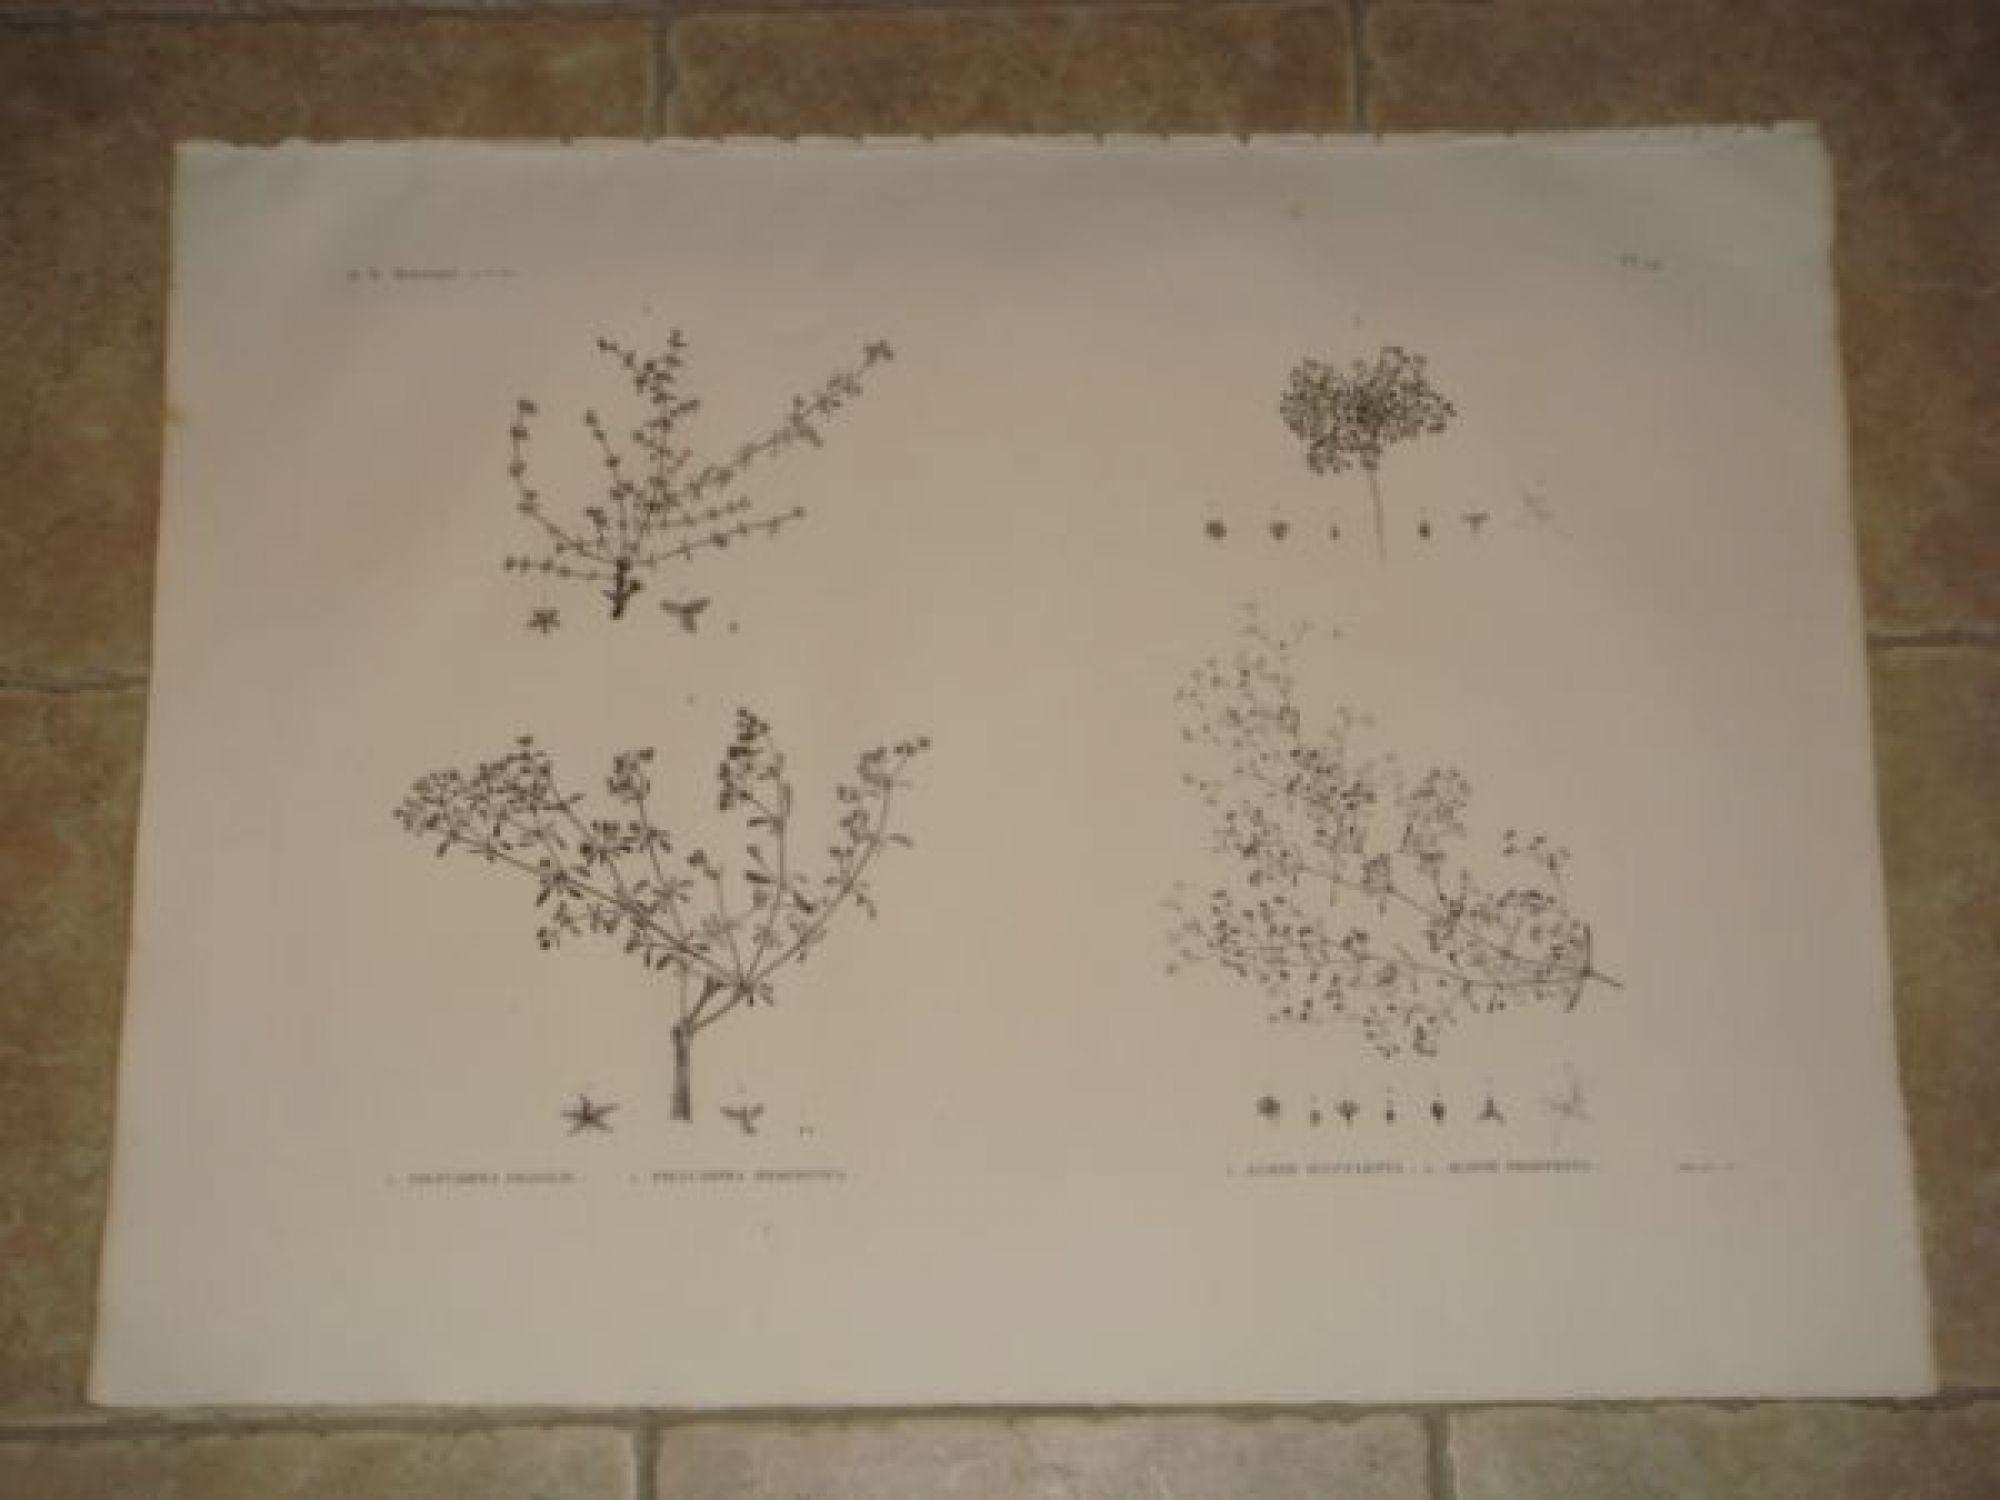 description de l 39 egypte botanique polycarpea fragilis polycarpea memphitica alsine. Black Bedroom Furniture Sets. Home Design Ideas